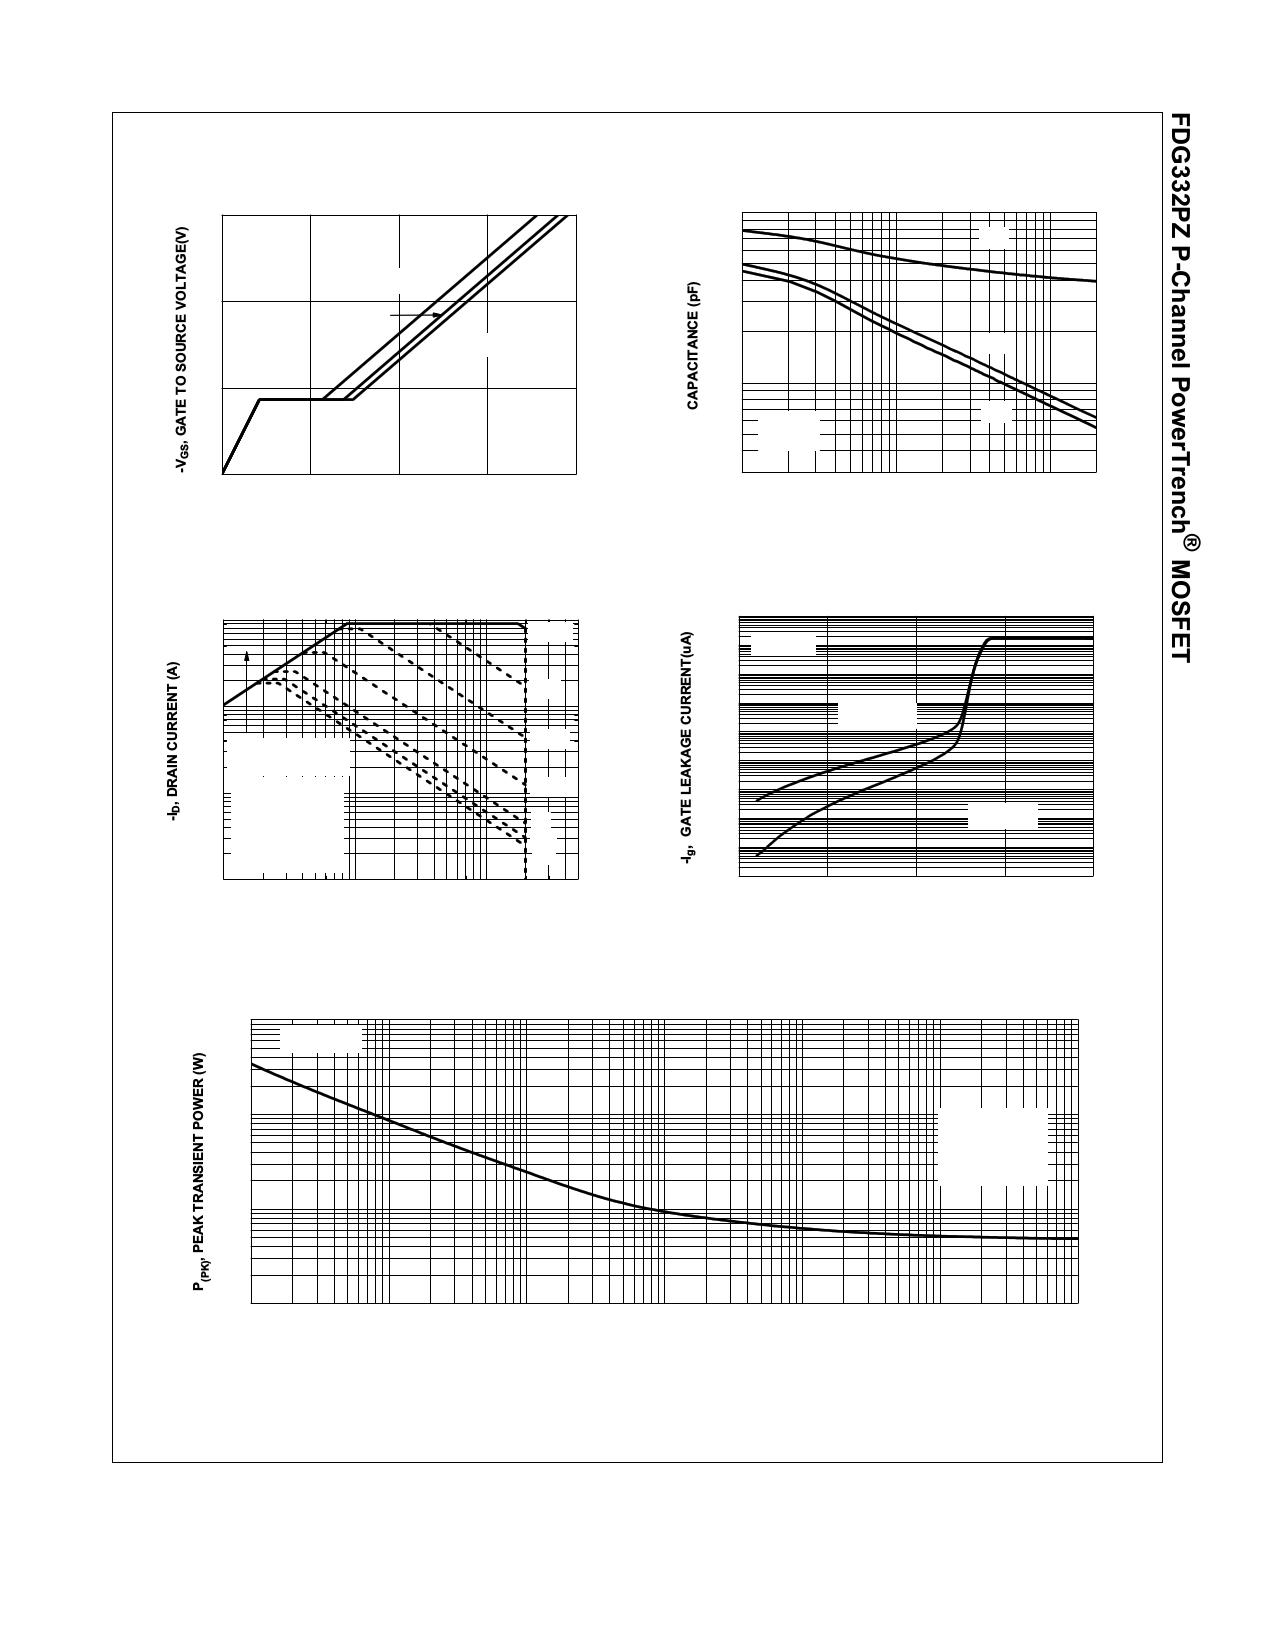 FDG332PZ pdf, 반도체, 판매, 대치품